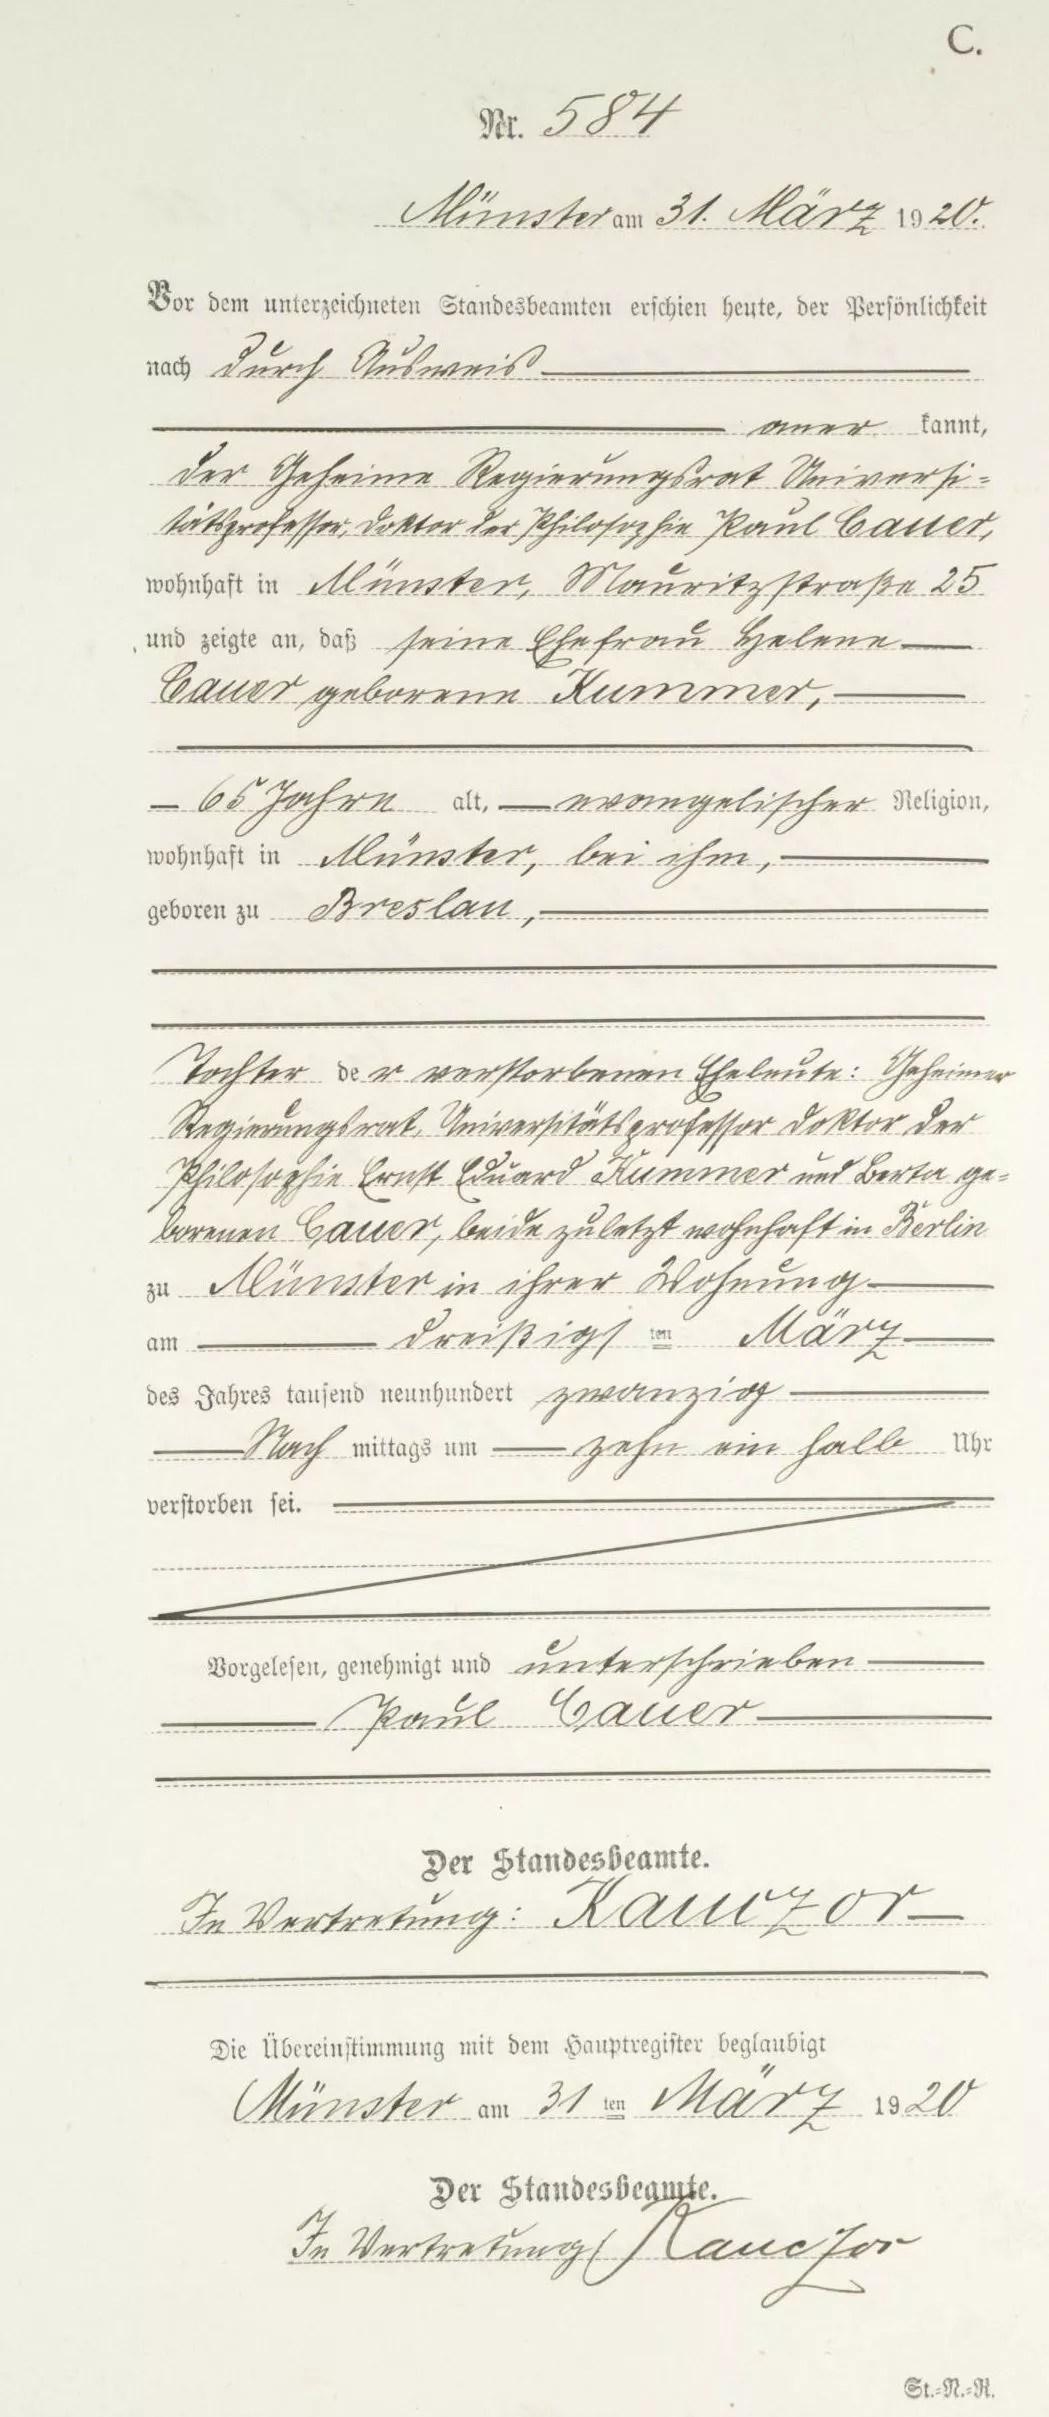 Death Record of Helene Kummer Cauer [Credit: MyHeritage Germany, North Rhine Westphalia, Death Index 1870–1940]